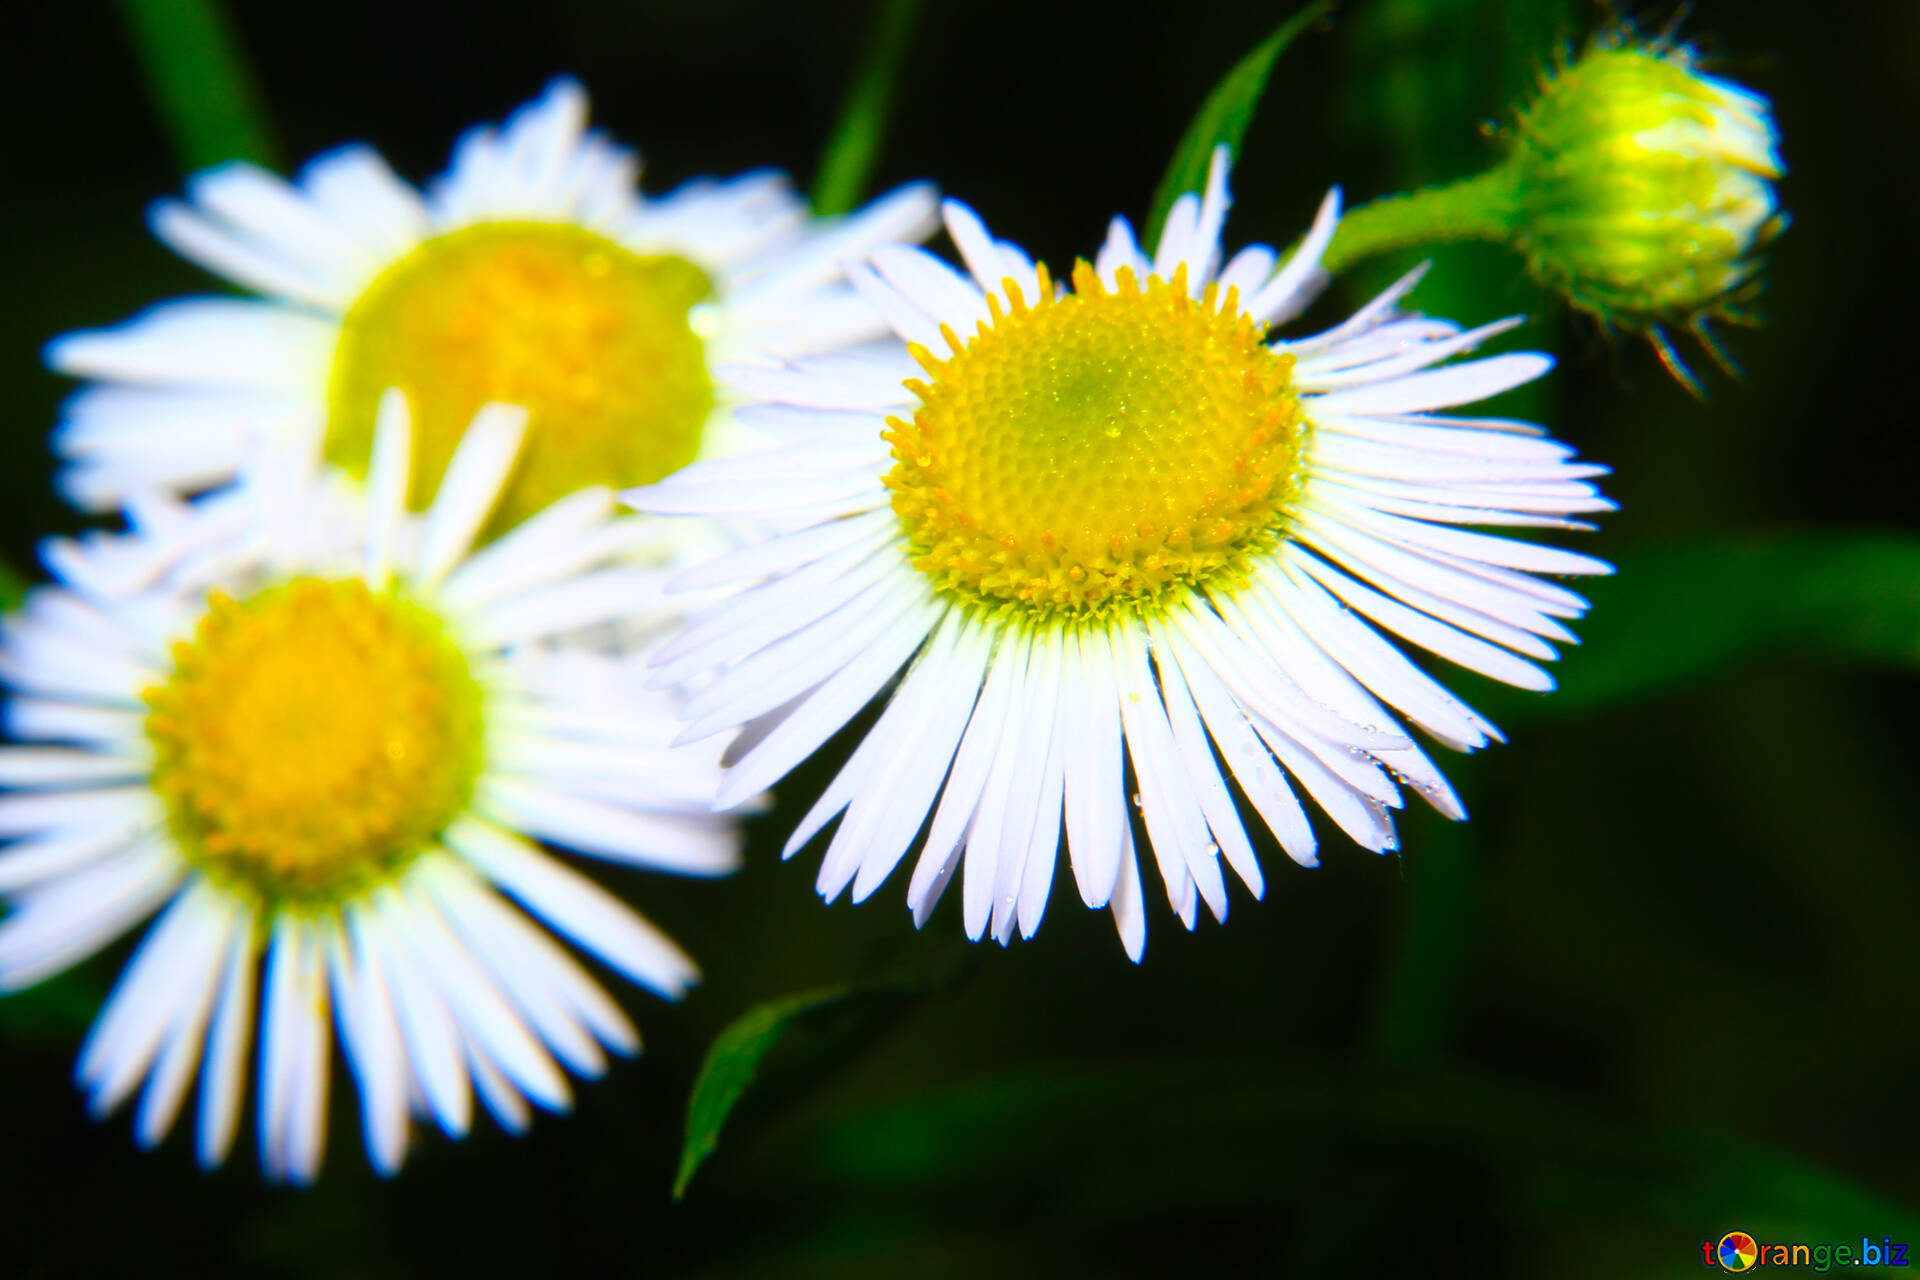 Wild aster daisy flowers like daisies summer 33403 download free image flowers like daisies in hd wallpaper size 1920px izmirmasajfo